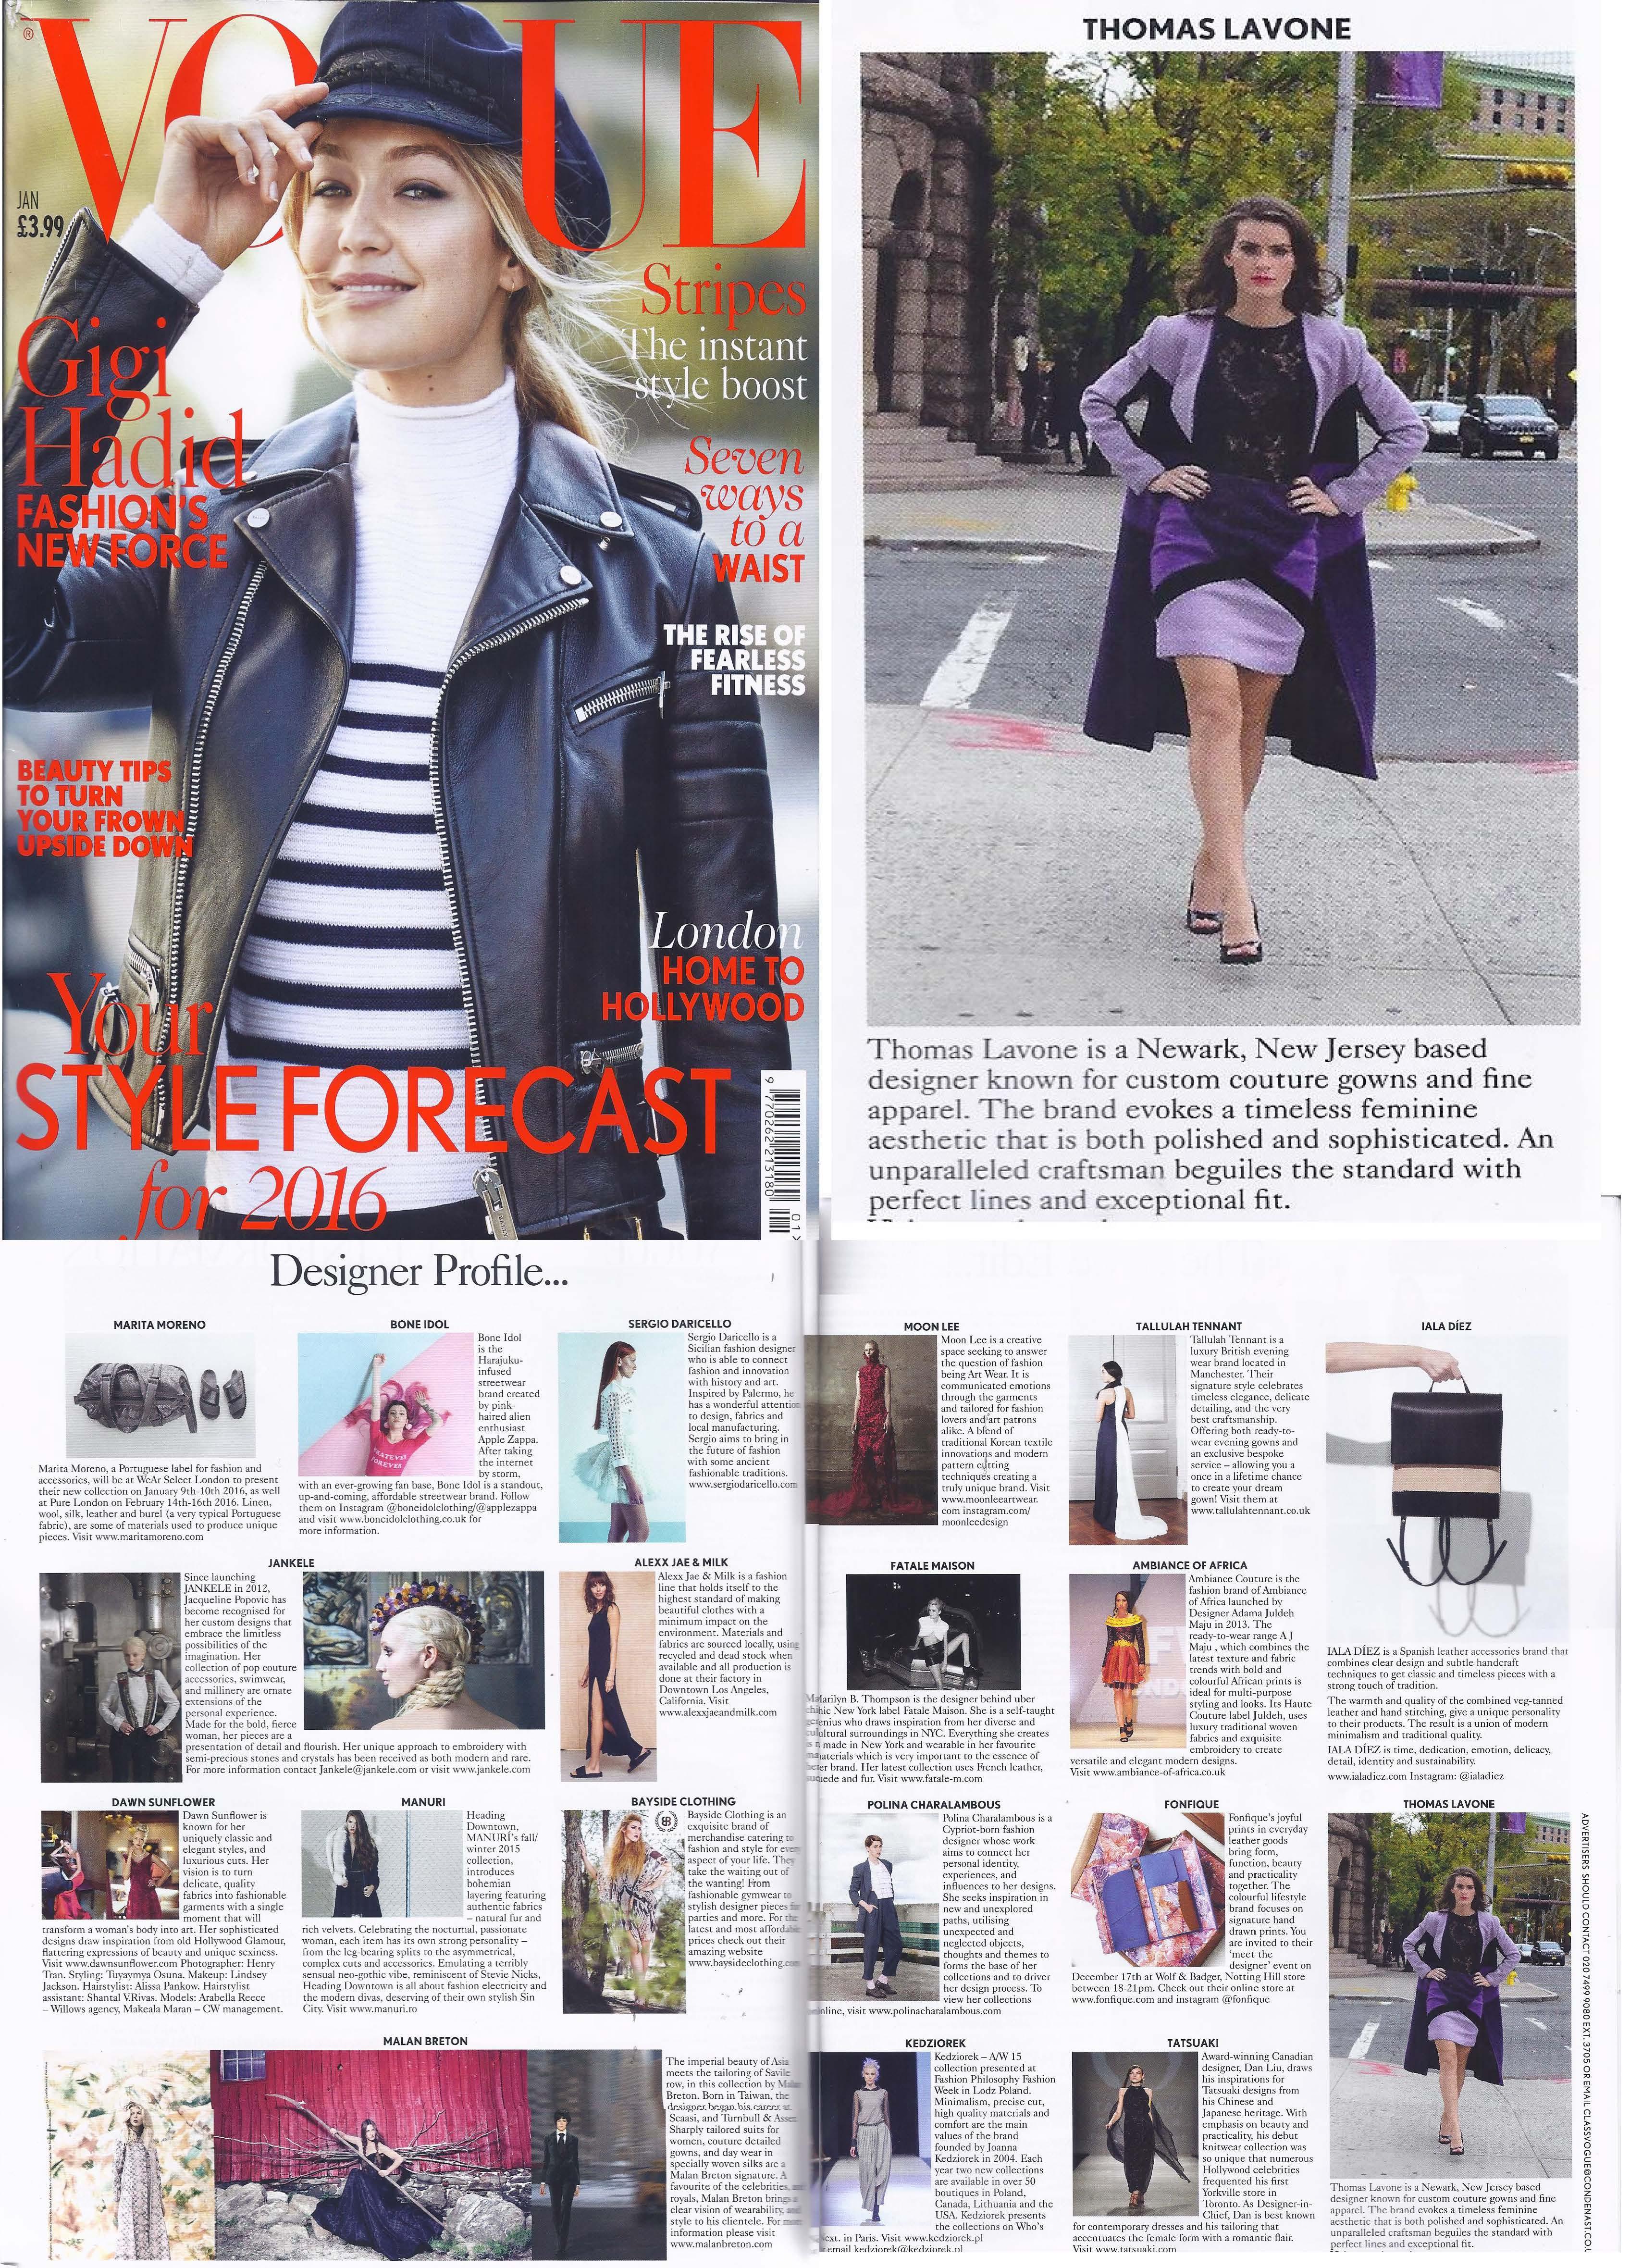 Vogue jan 2016 UK cover